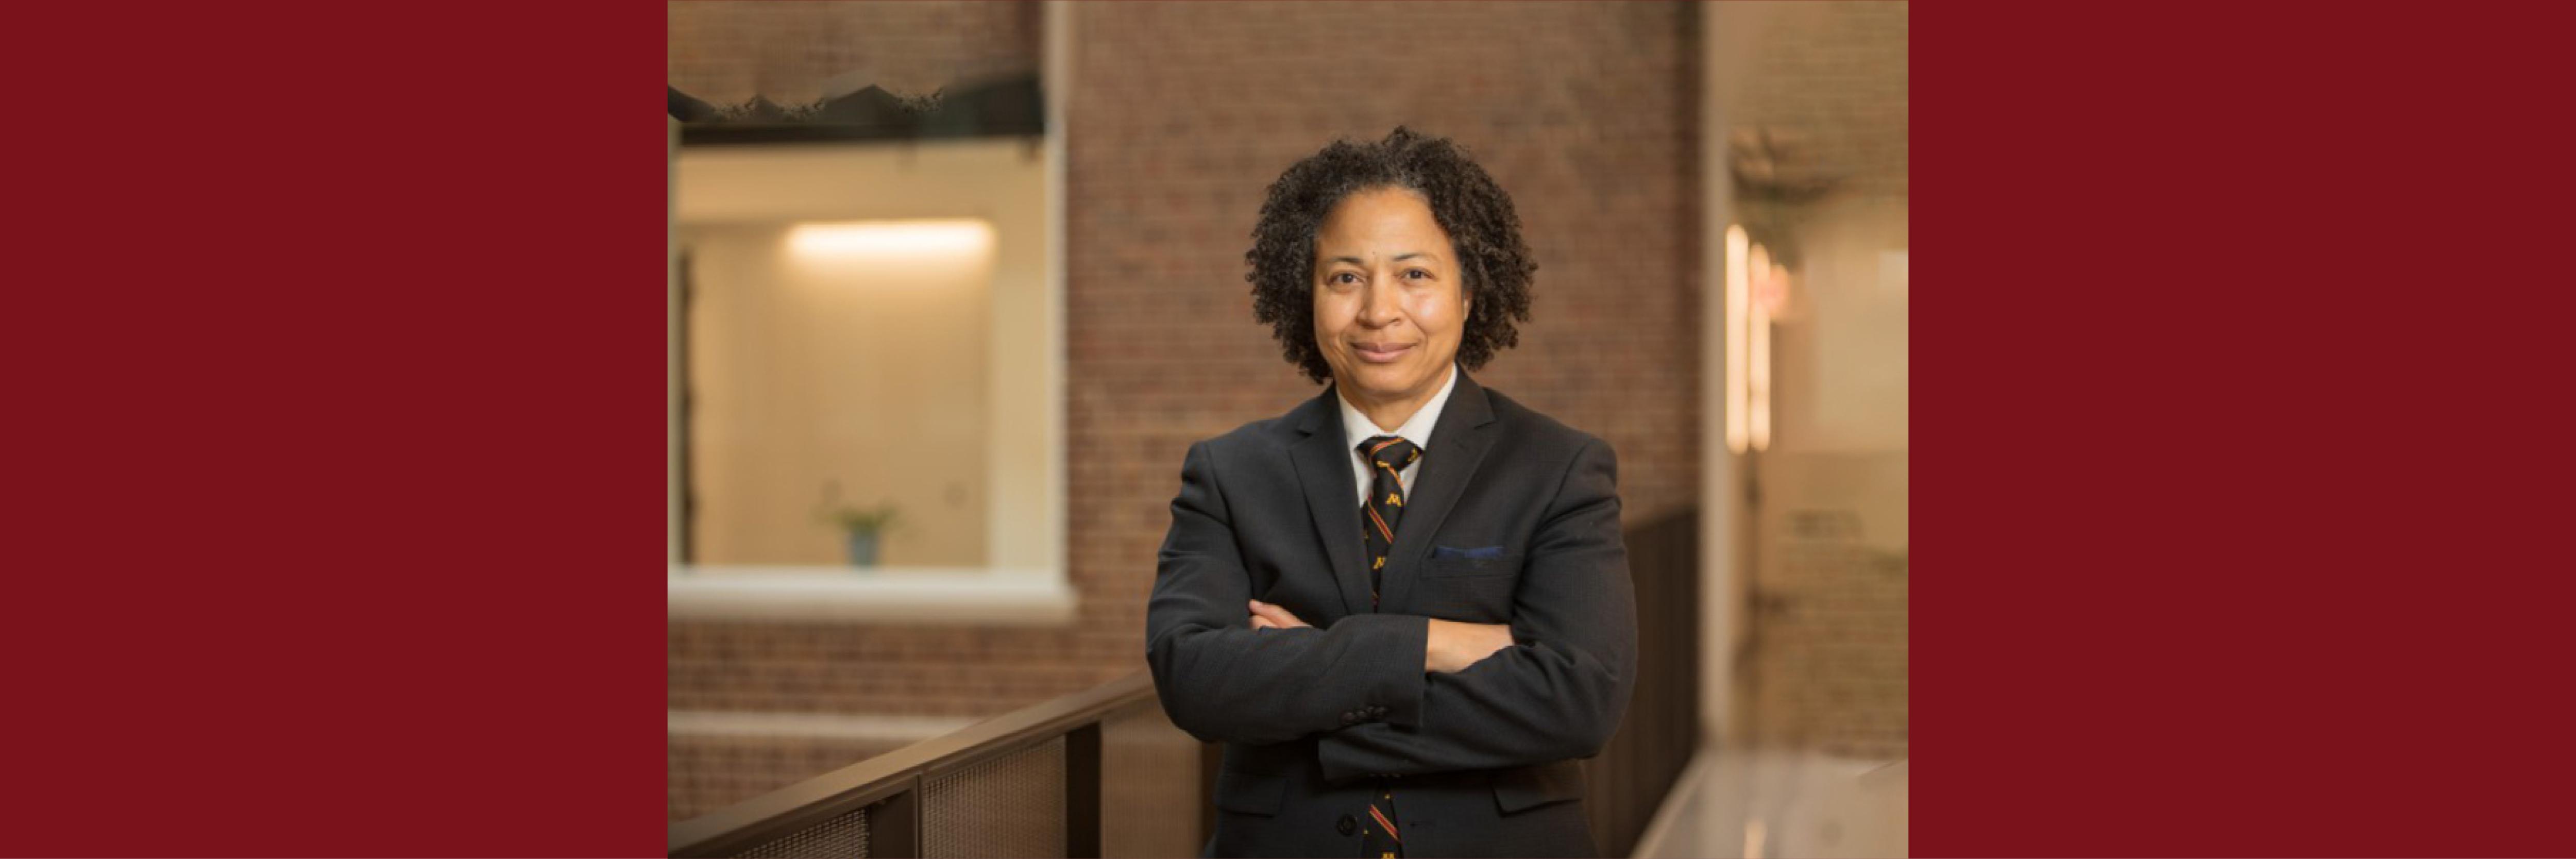 Dr. Renee Crichlow